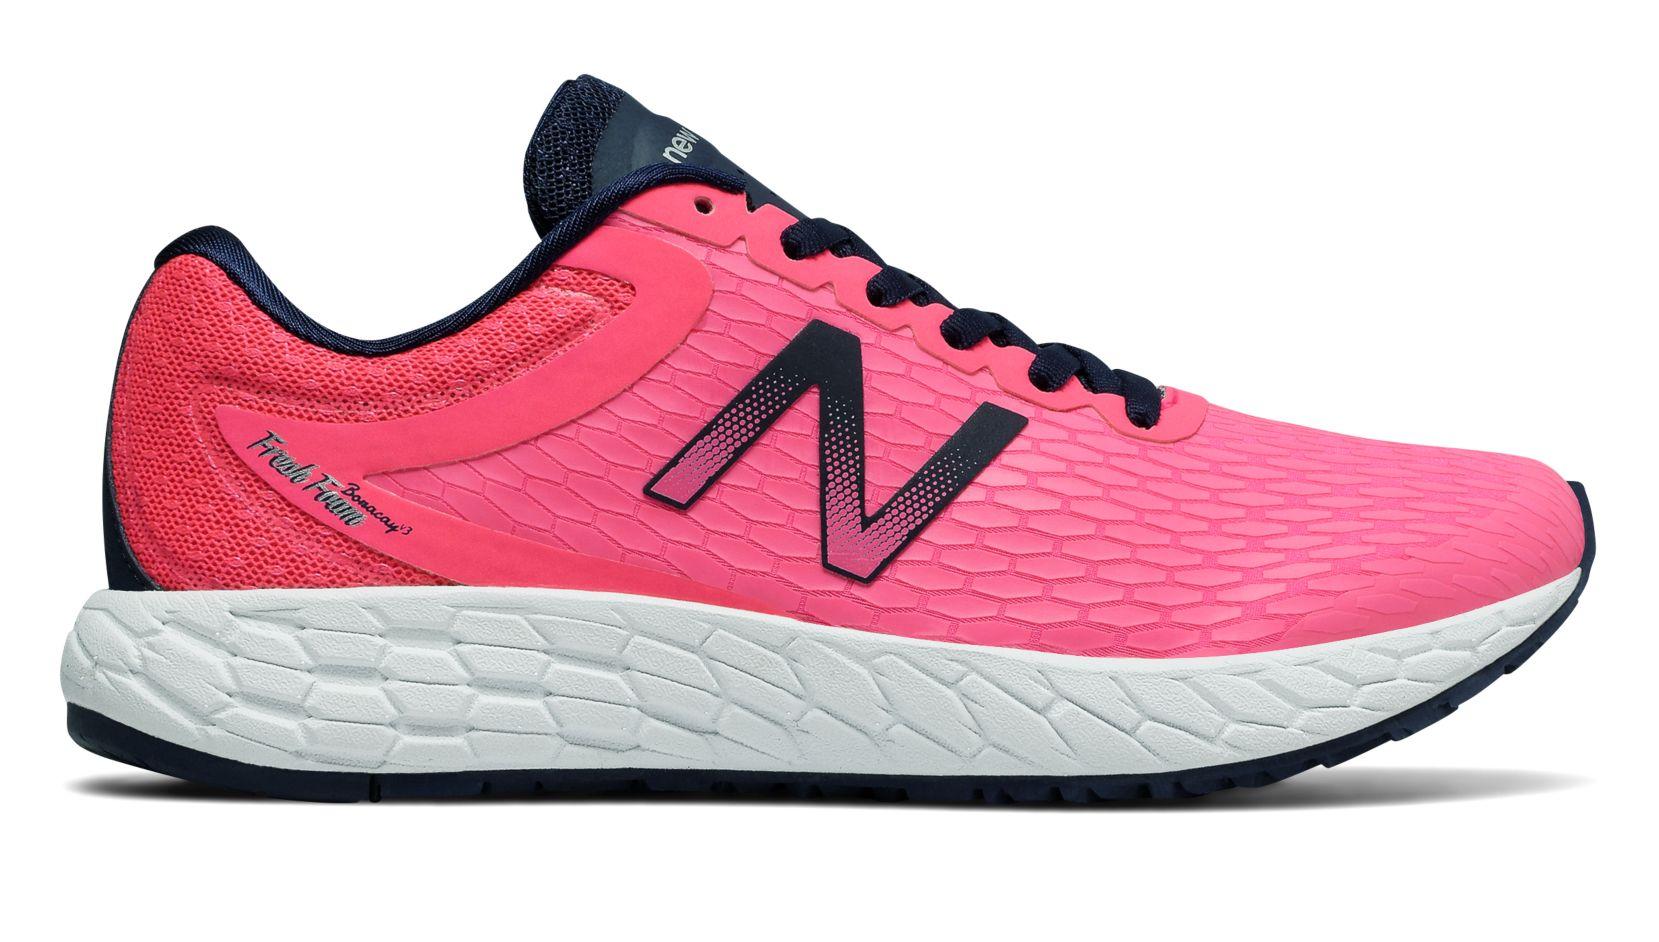 NB Fresh Foam Boracay v3 Alpha Pink with Vivid Tangerine  Pigment